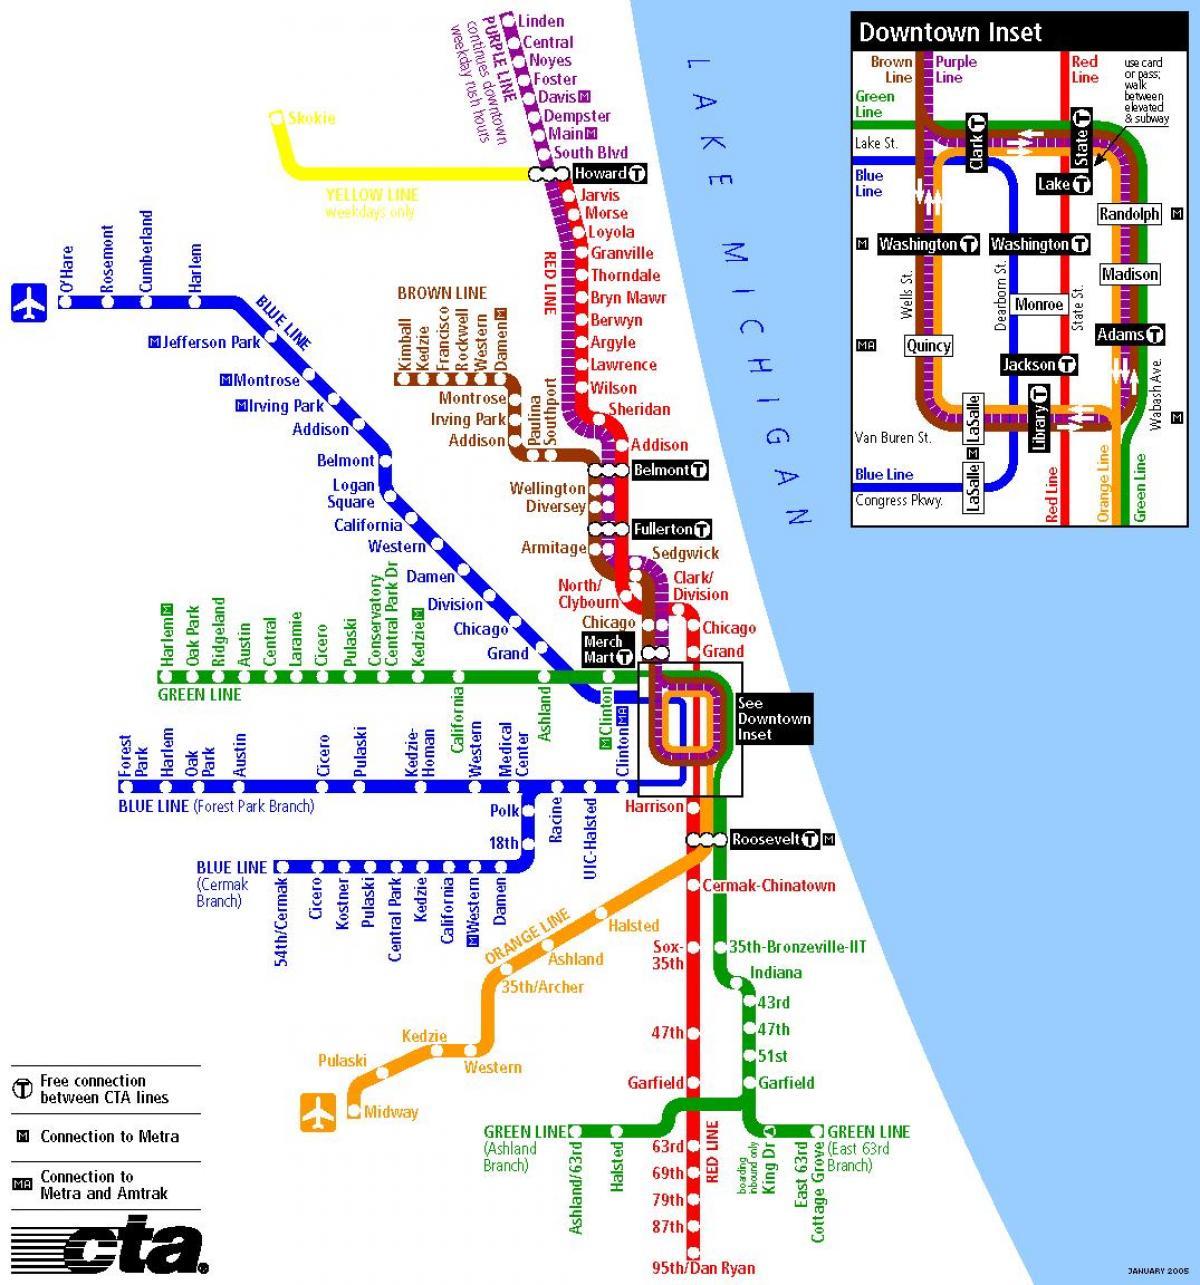 Karta Usa Chicago.Tunnelbana Karta Chicago Tunnelbana I Chicago Karta Usa